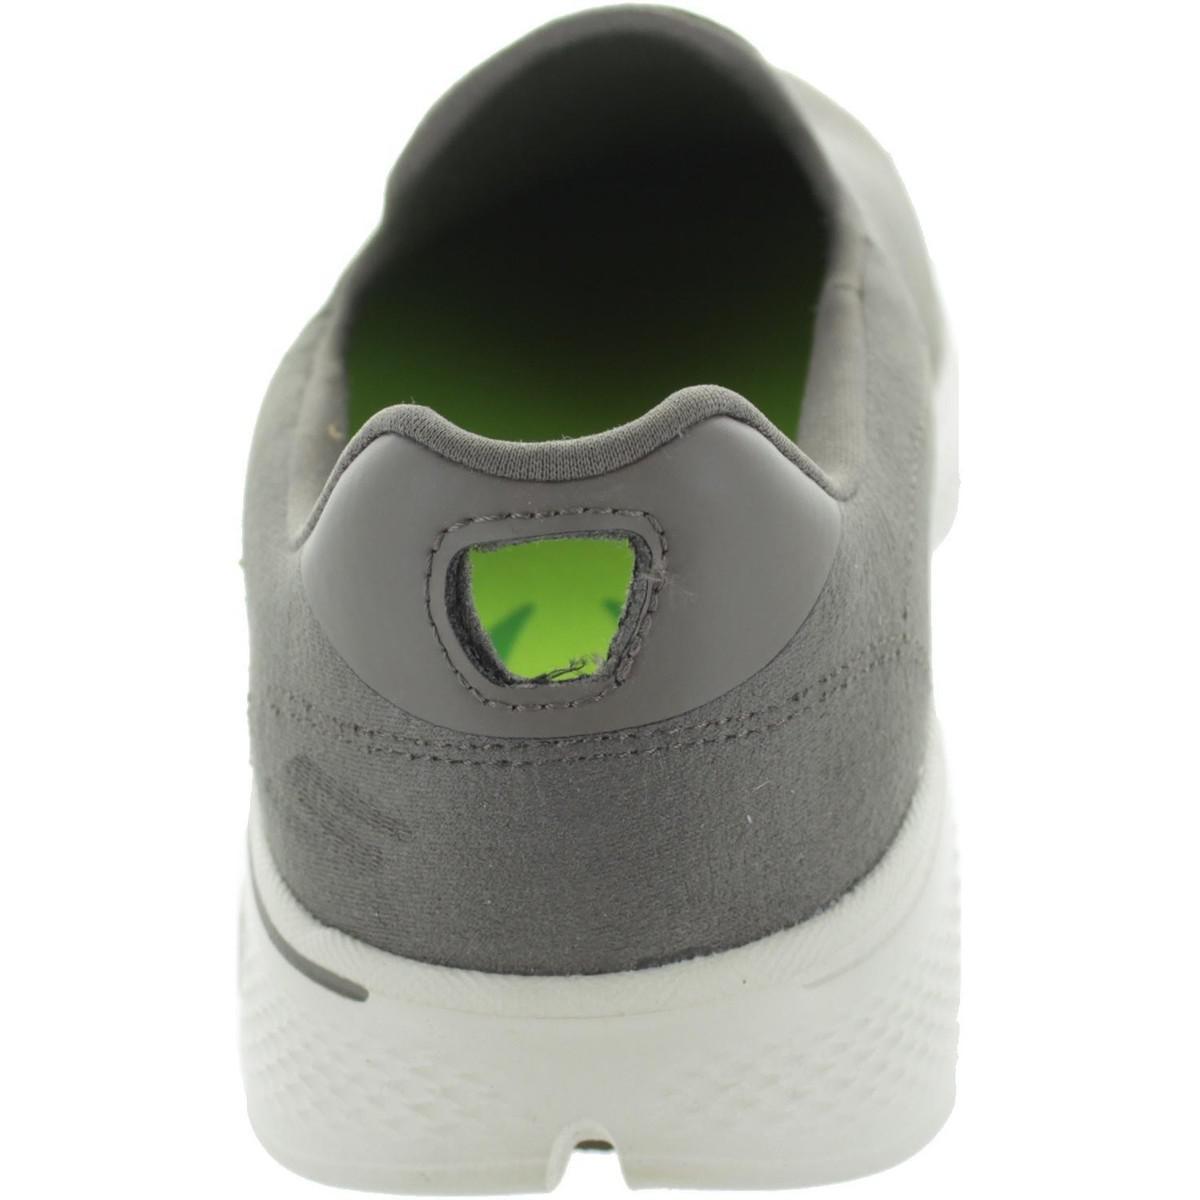 Skechers - Gray Gowalk 4 Remarkable Men's Loafers / Casual Shoes In Grey for Men -. View fullscreen